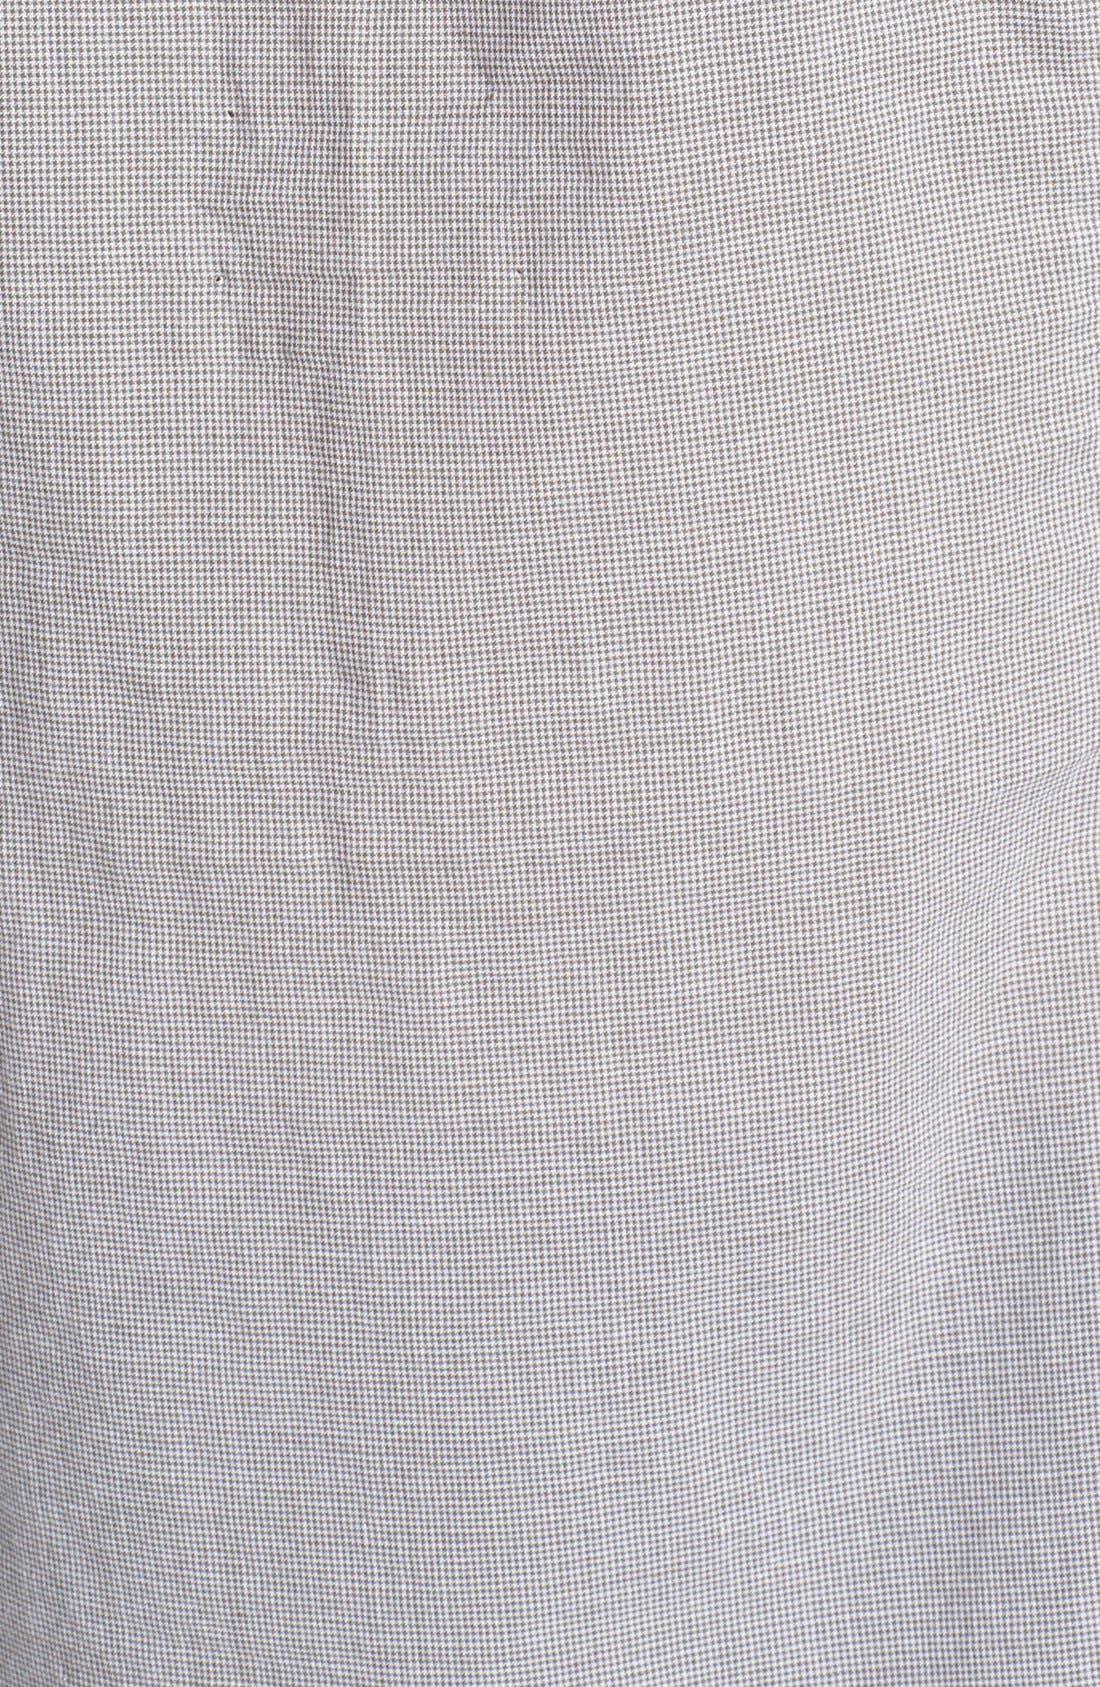 Long Sleeve Shirt,                             Alternate thumbnail 49, color,